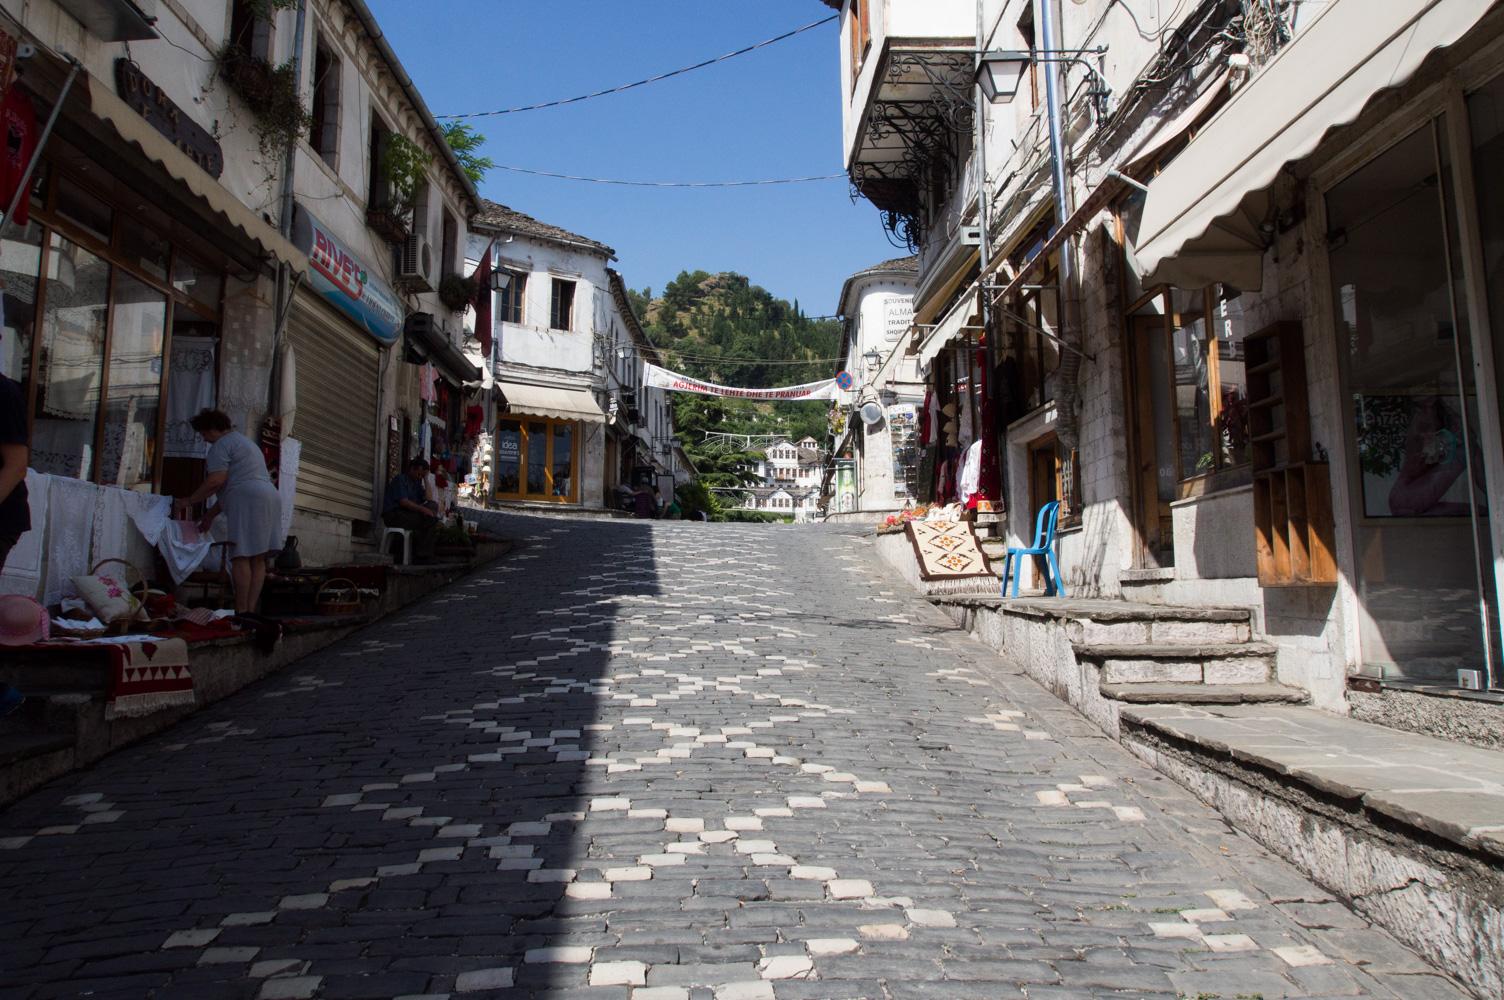 albania_gijrokaster-1-of-1-5